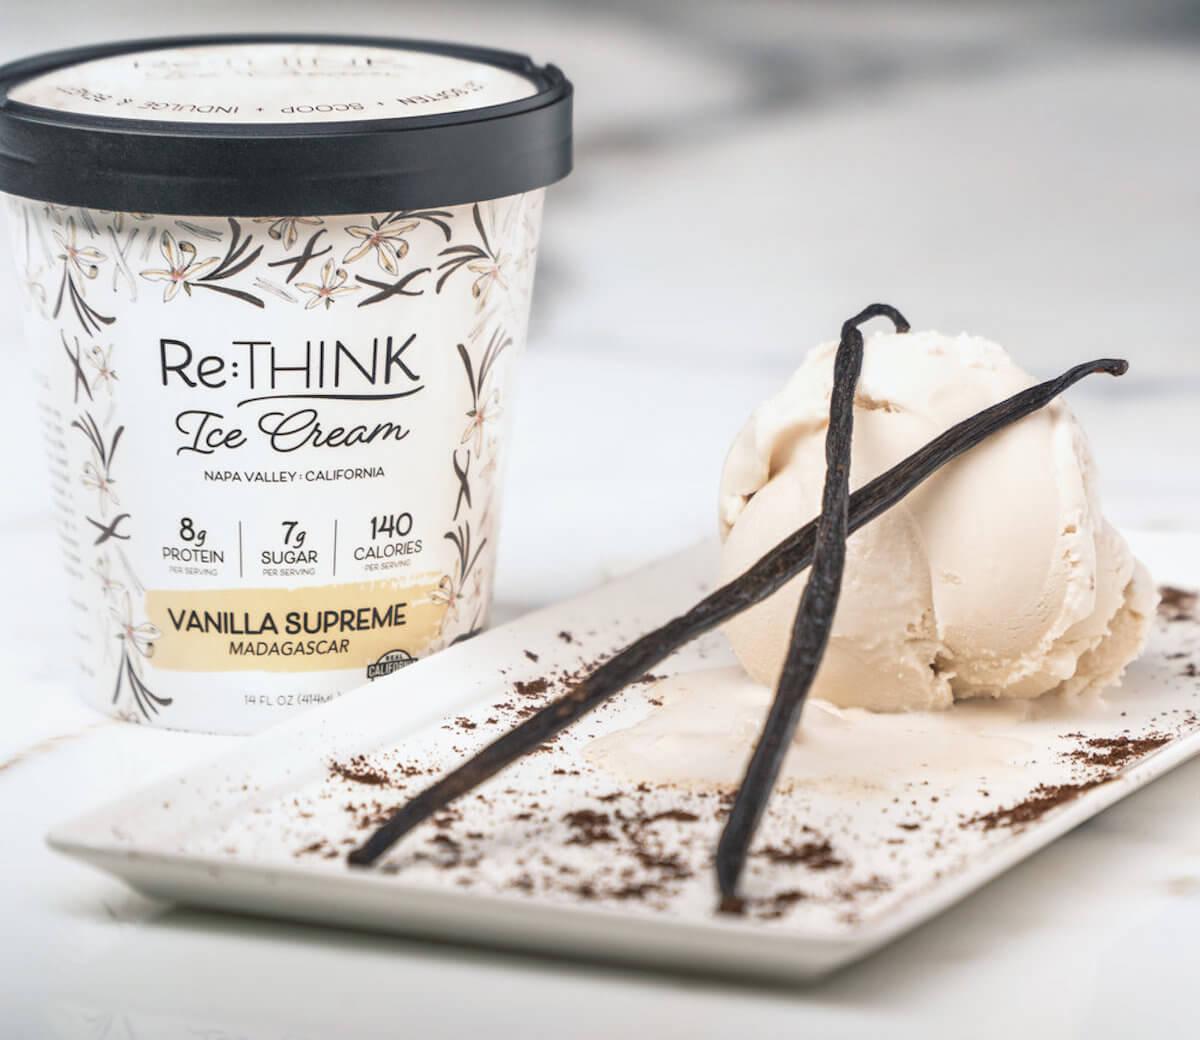 Re:Think ice cream - vanilla